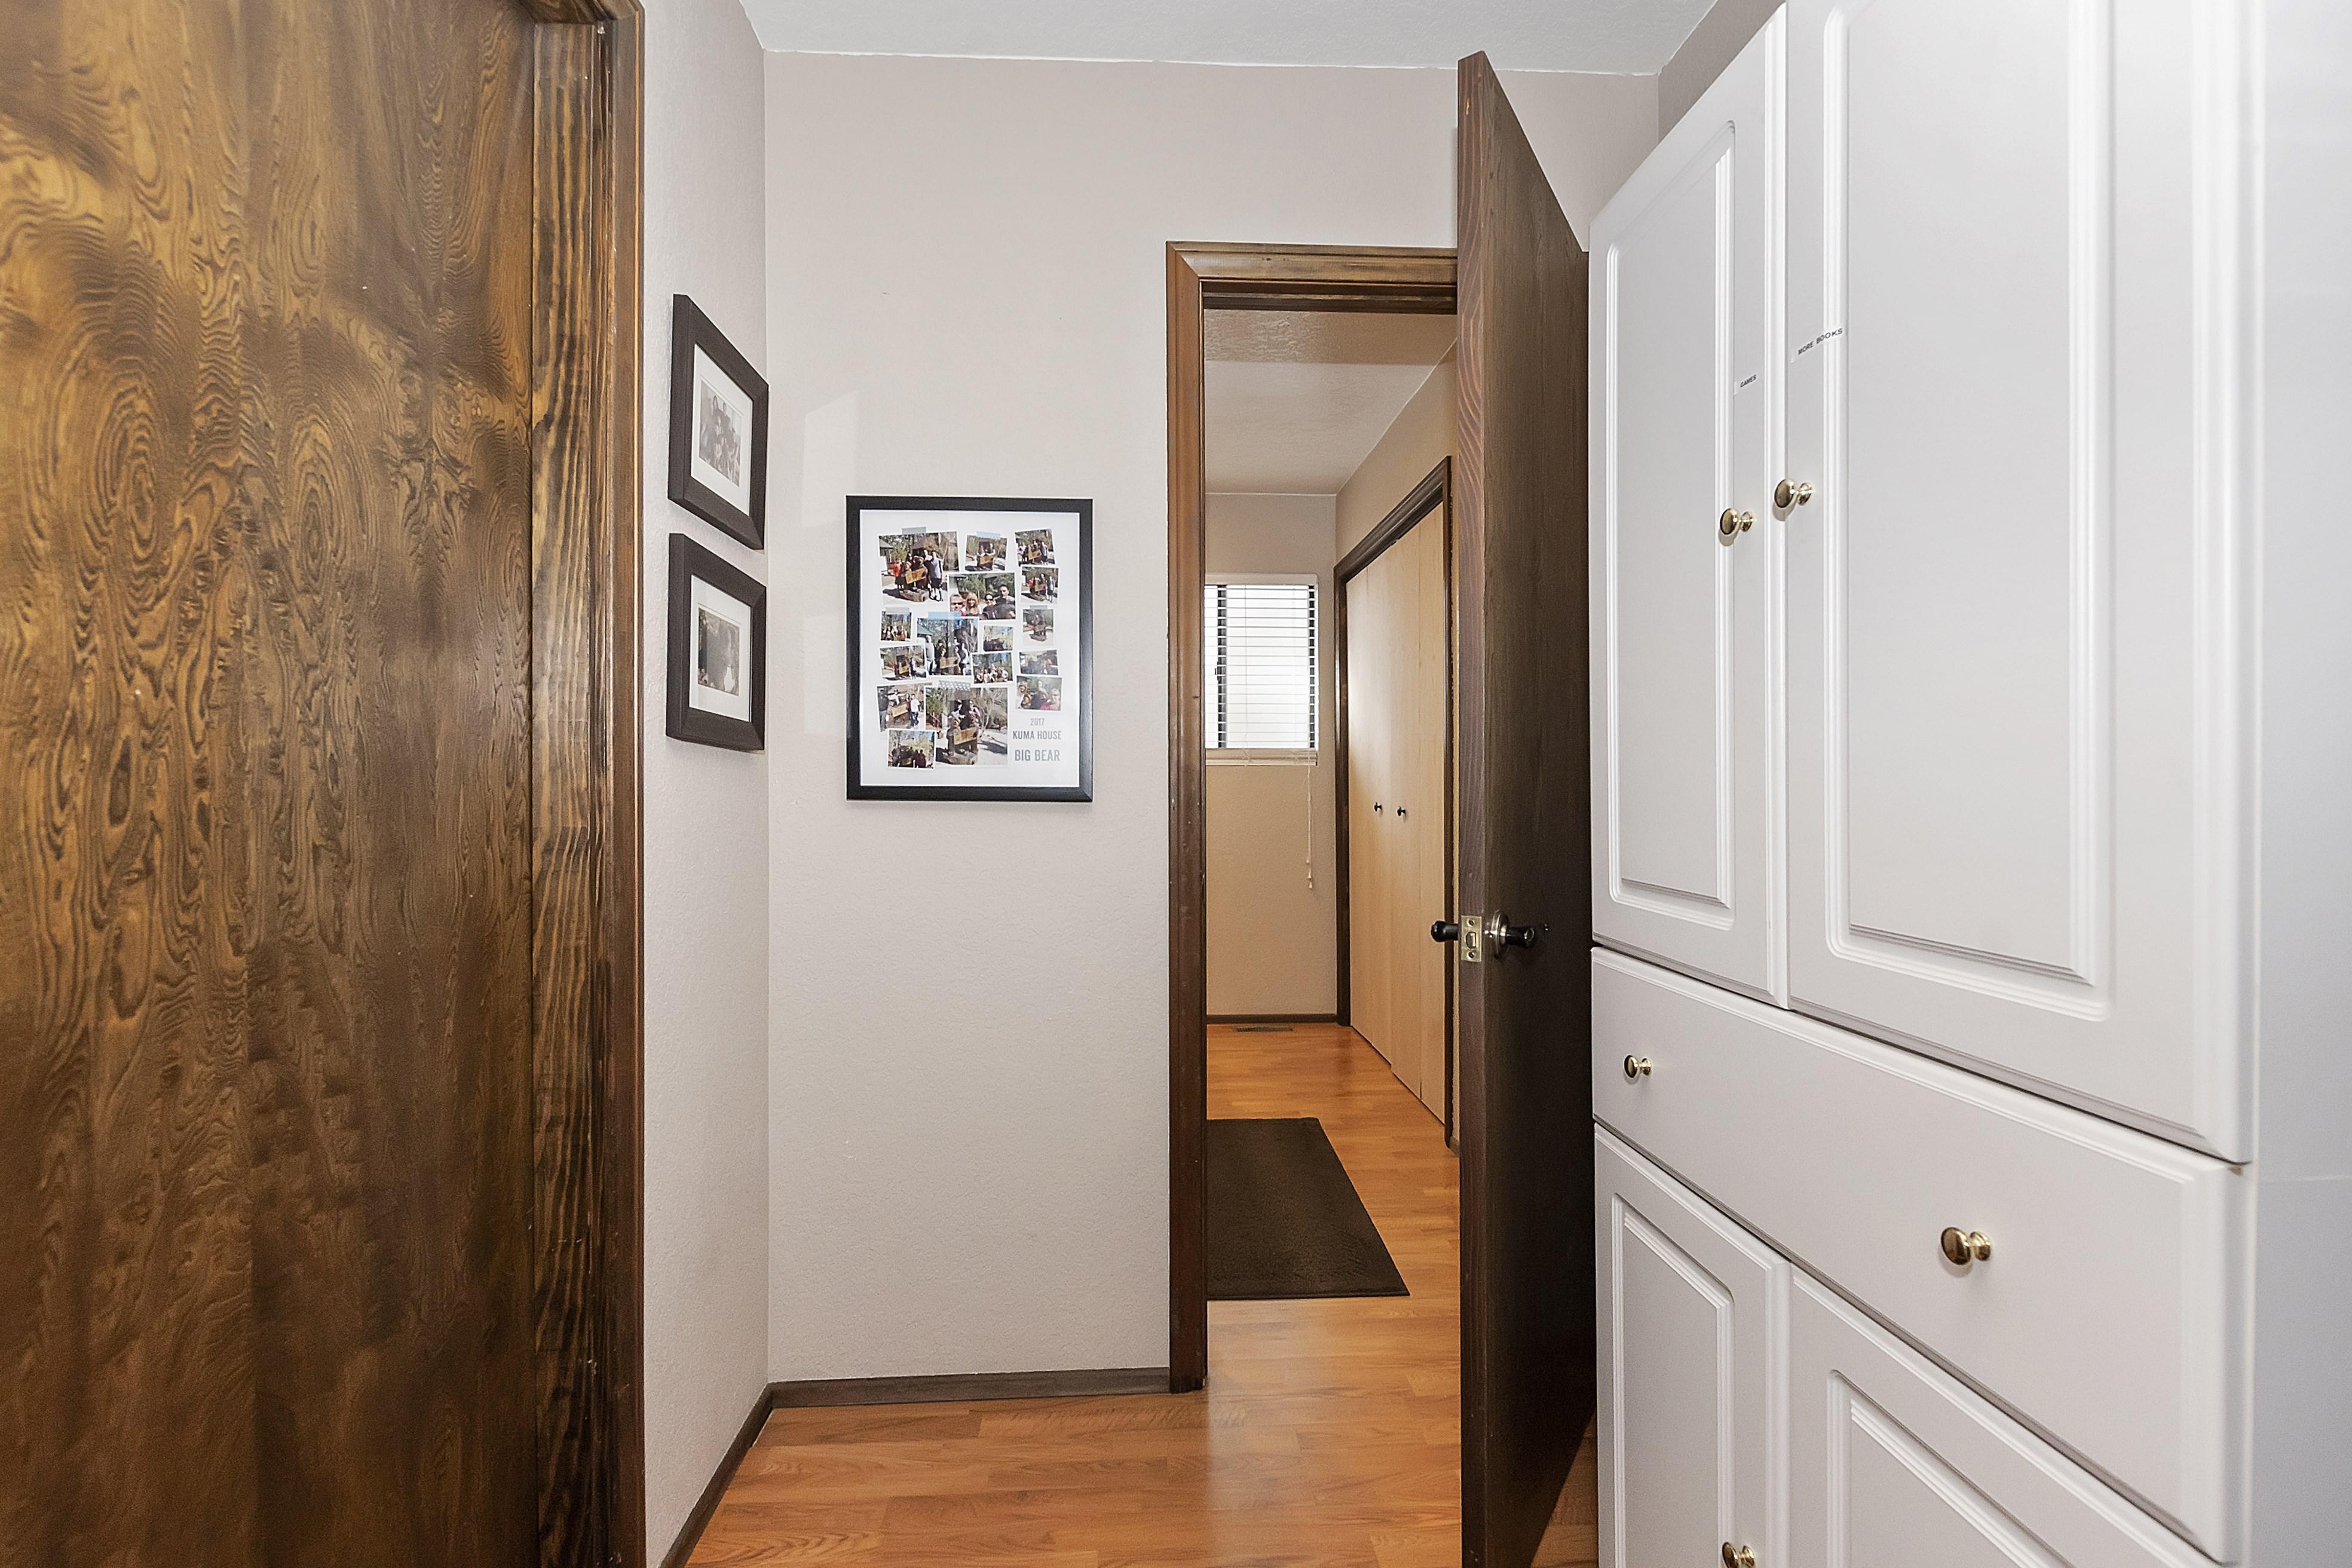 012_Hallway